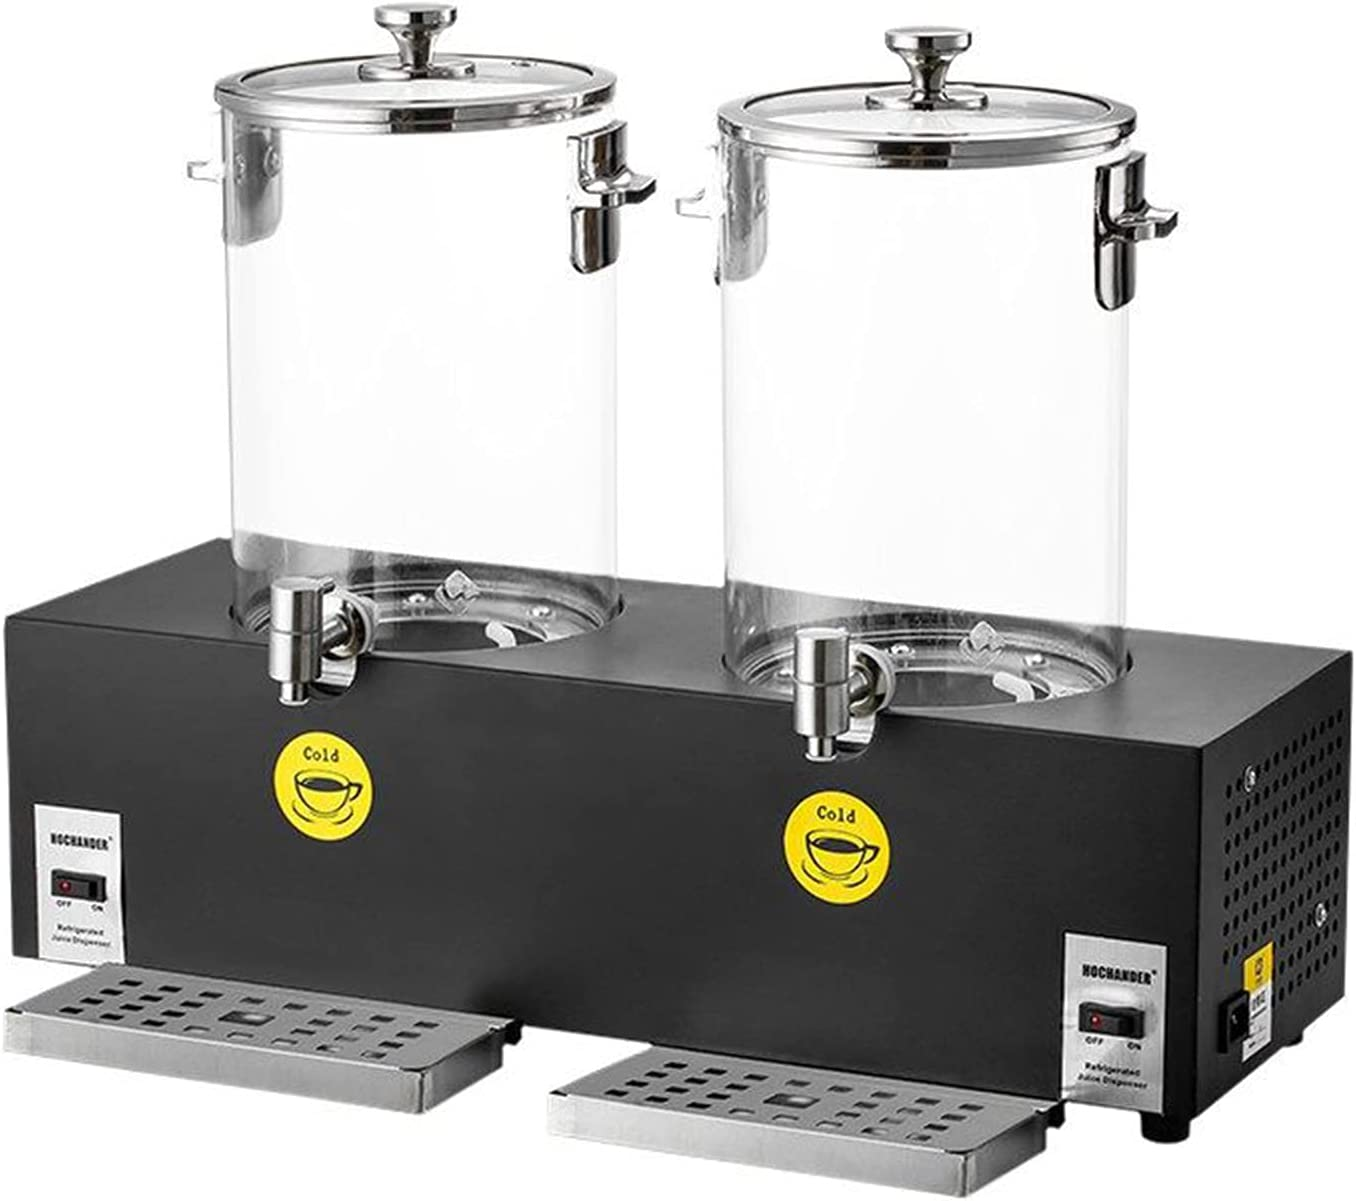 ALX-Dec Máquina De Bebidas De Buffet Acero Inoxidable Refrigeración Electrónica Comercial Dispensador De Jugo Temperatura Ajustable Doble Cabezal 20 litros Café Leche